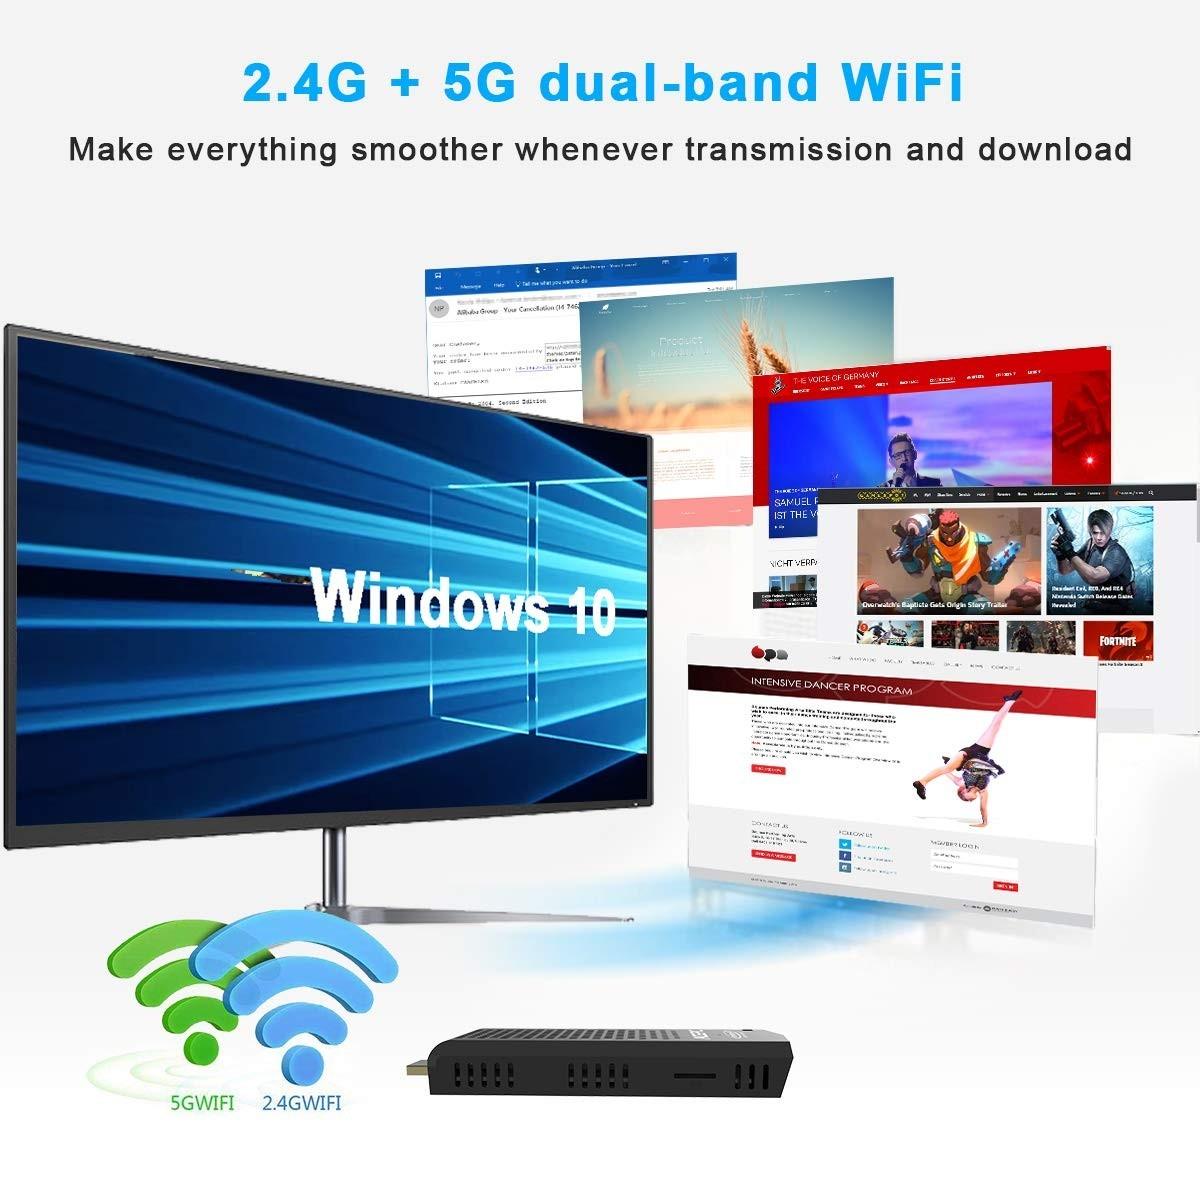 Acepc Mini Pc Intel Atom Z8350 Windows 10 Pro Stick 2gb/32gb